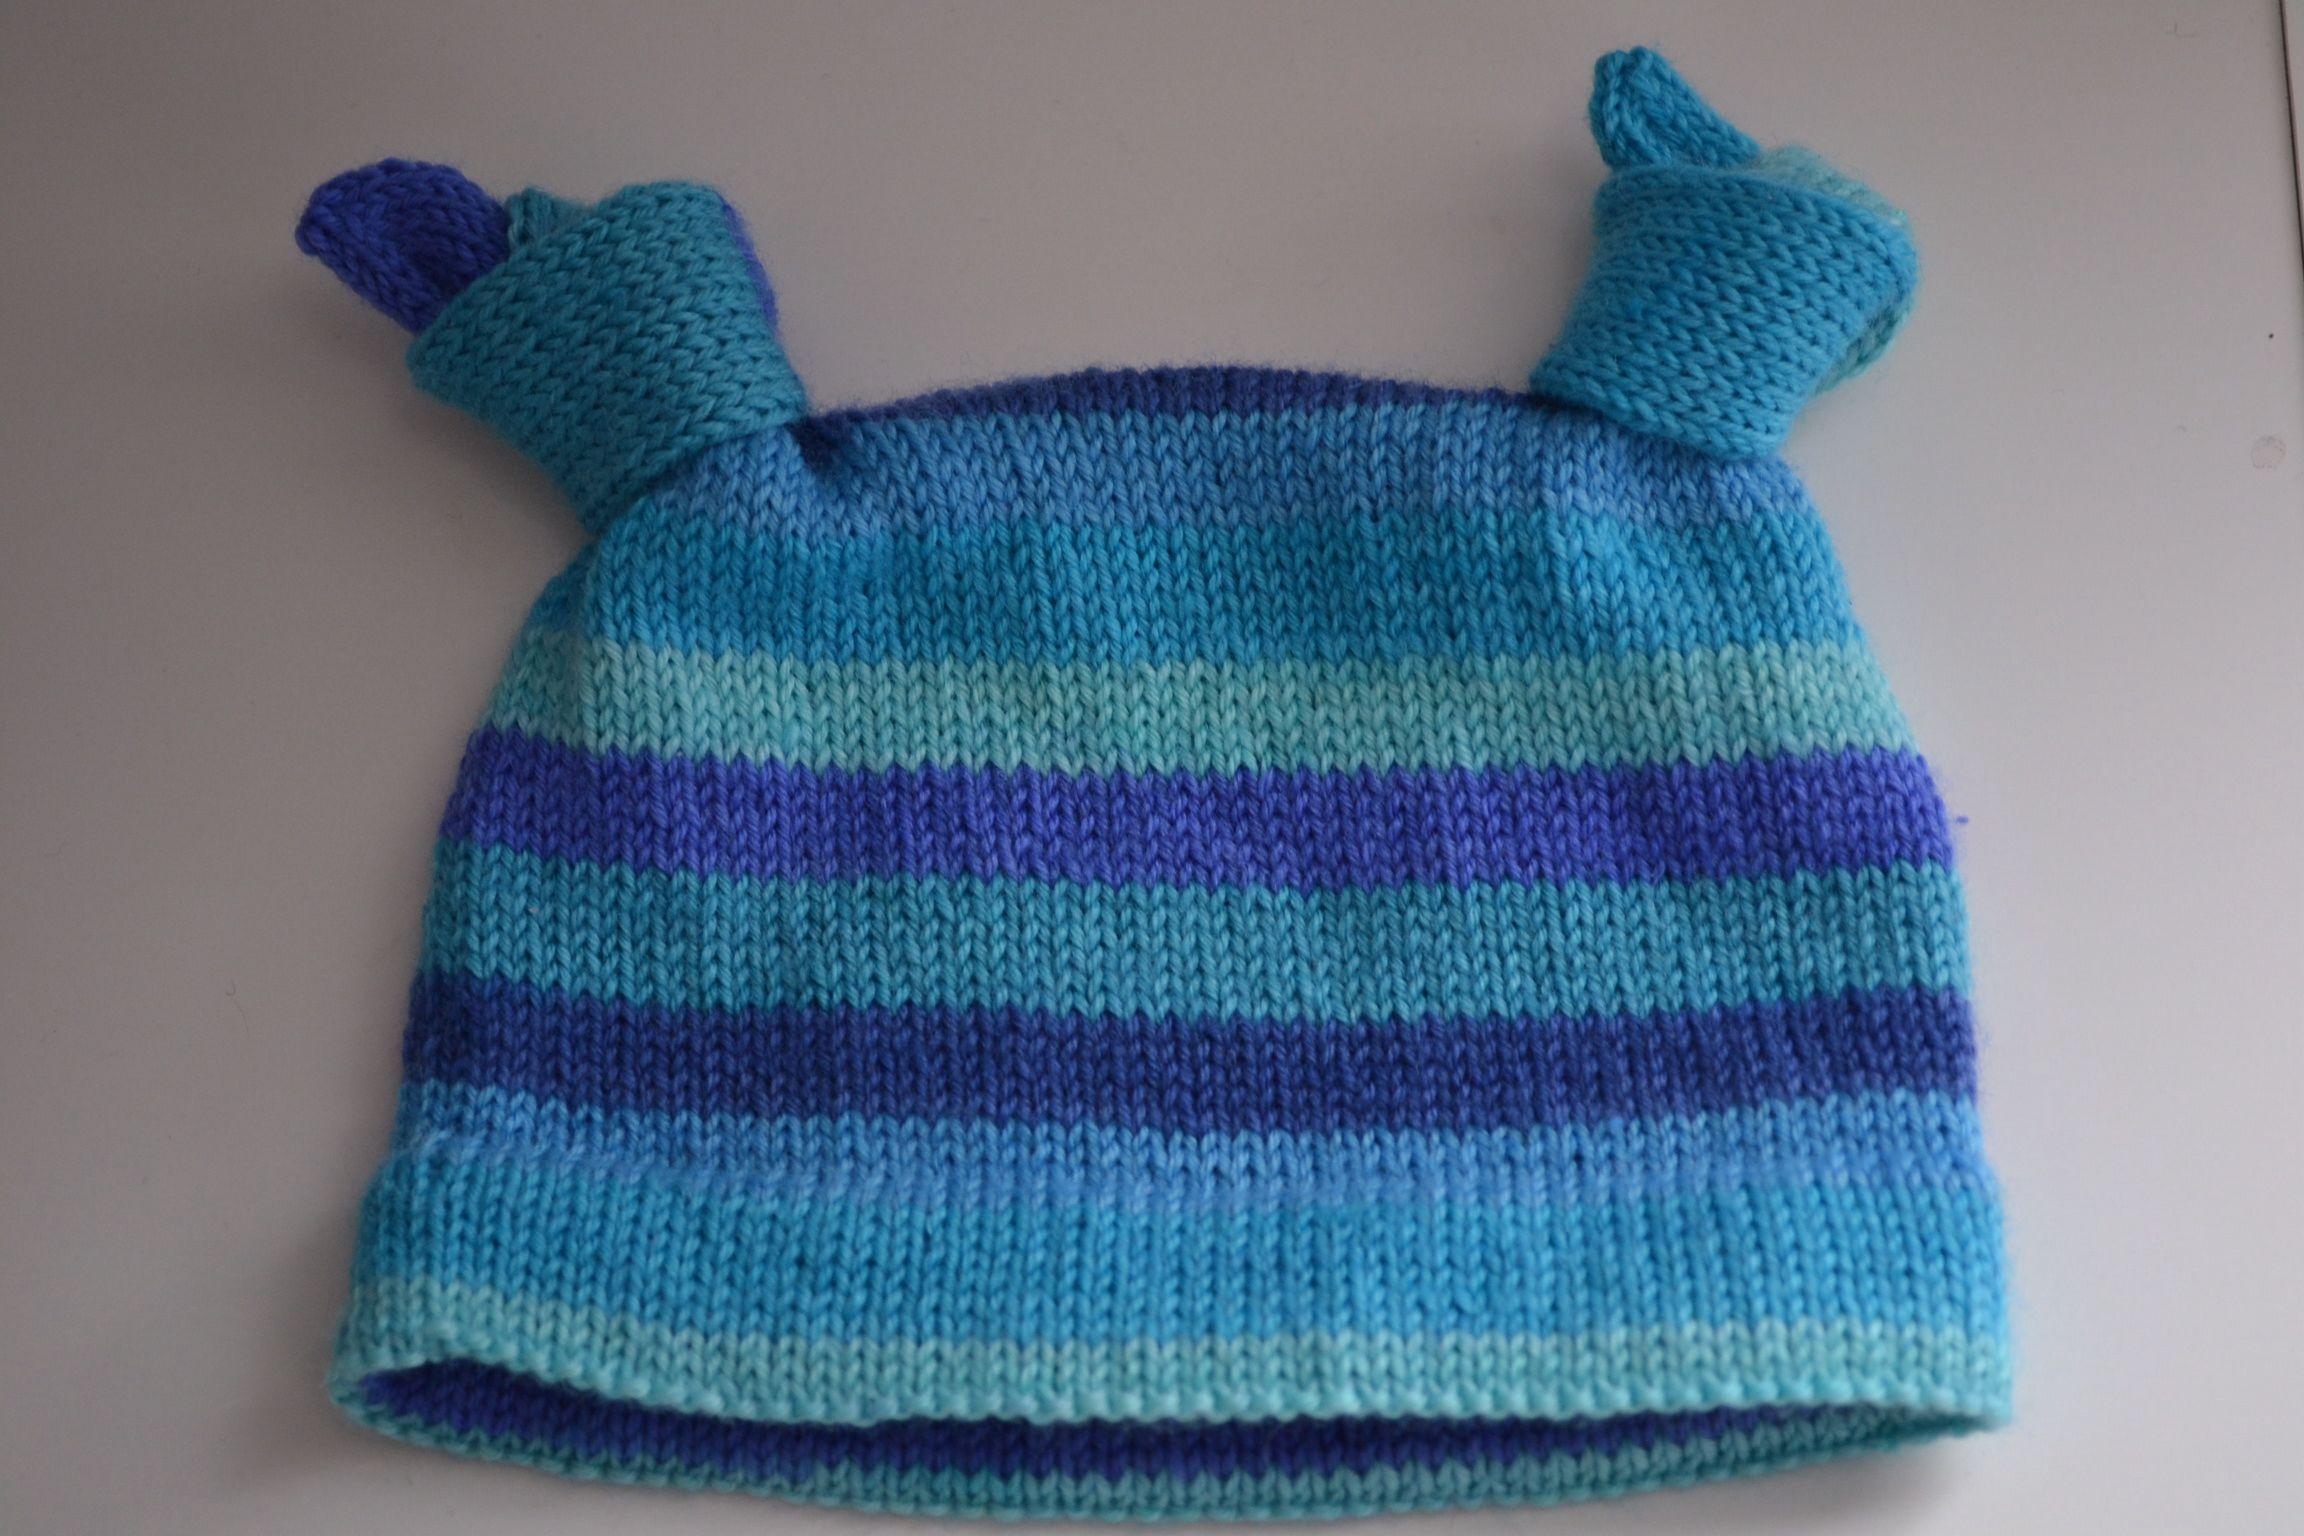 Knitting Knotty : Knotty baby hat pattern knitting patterns and crochet